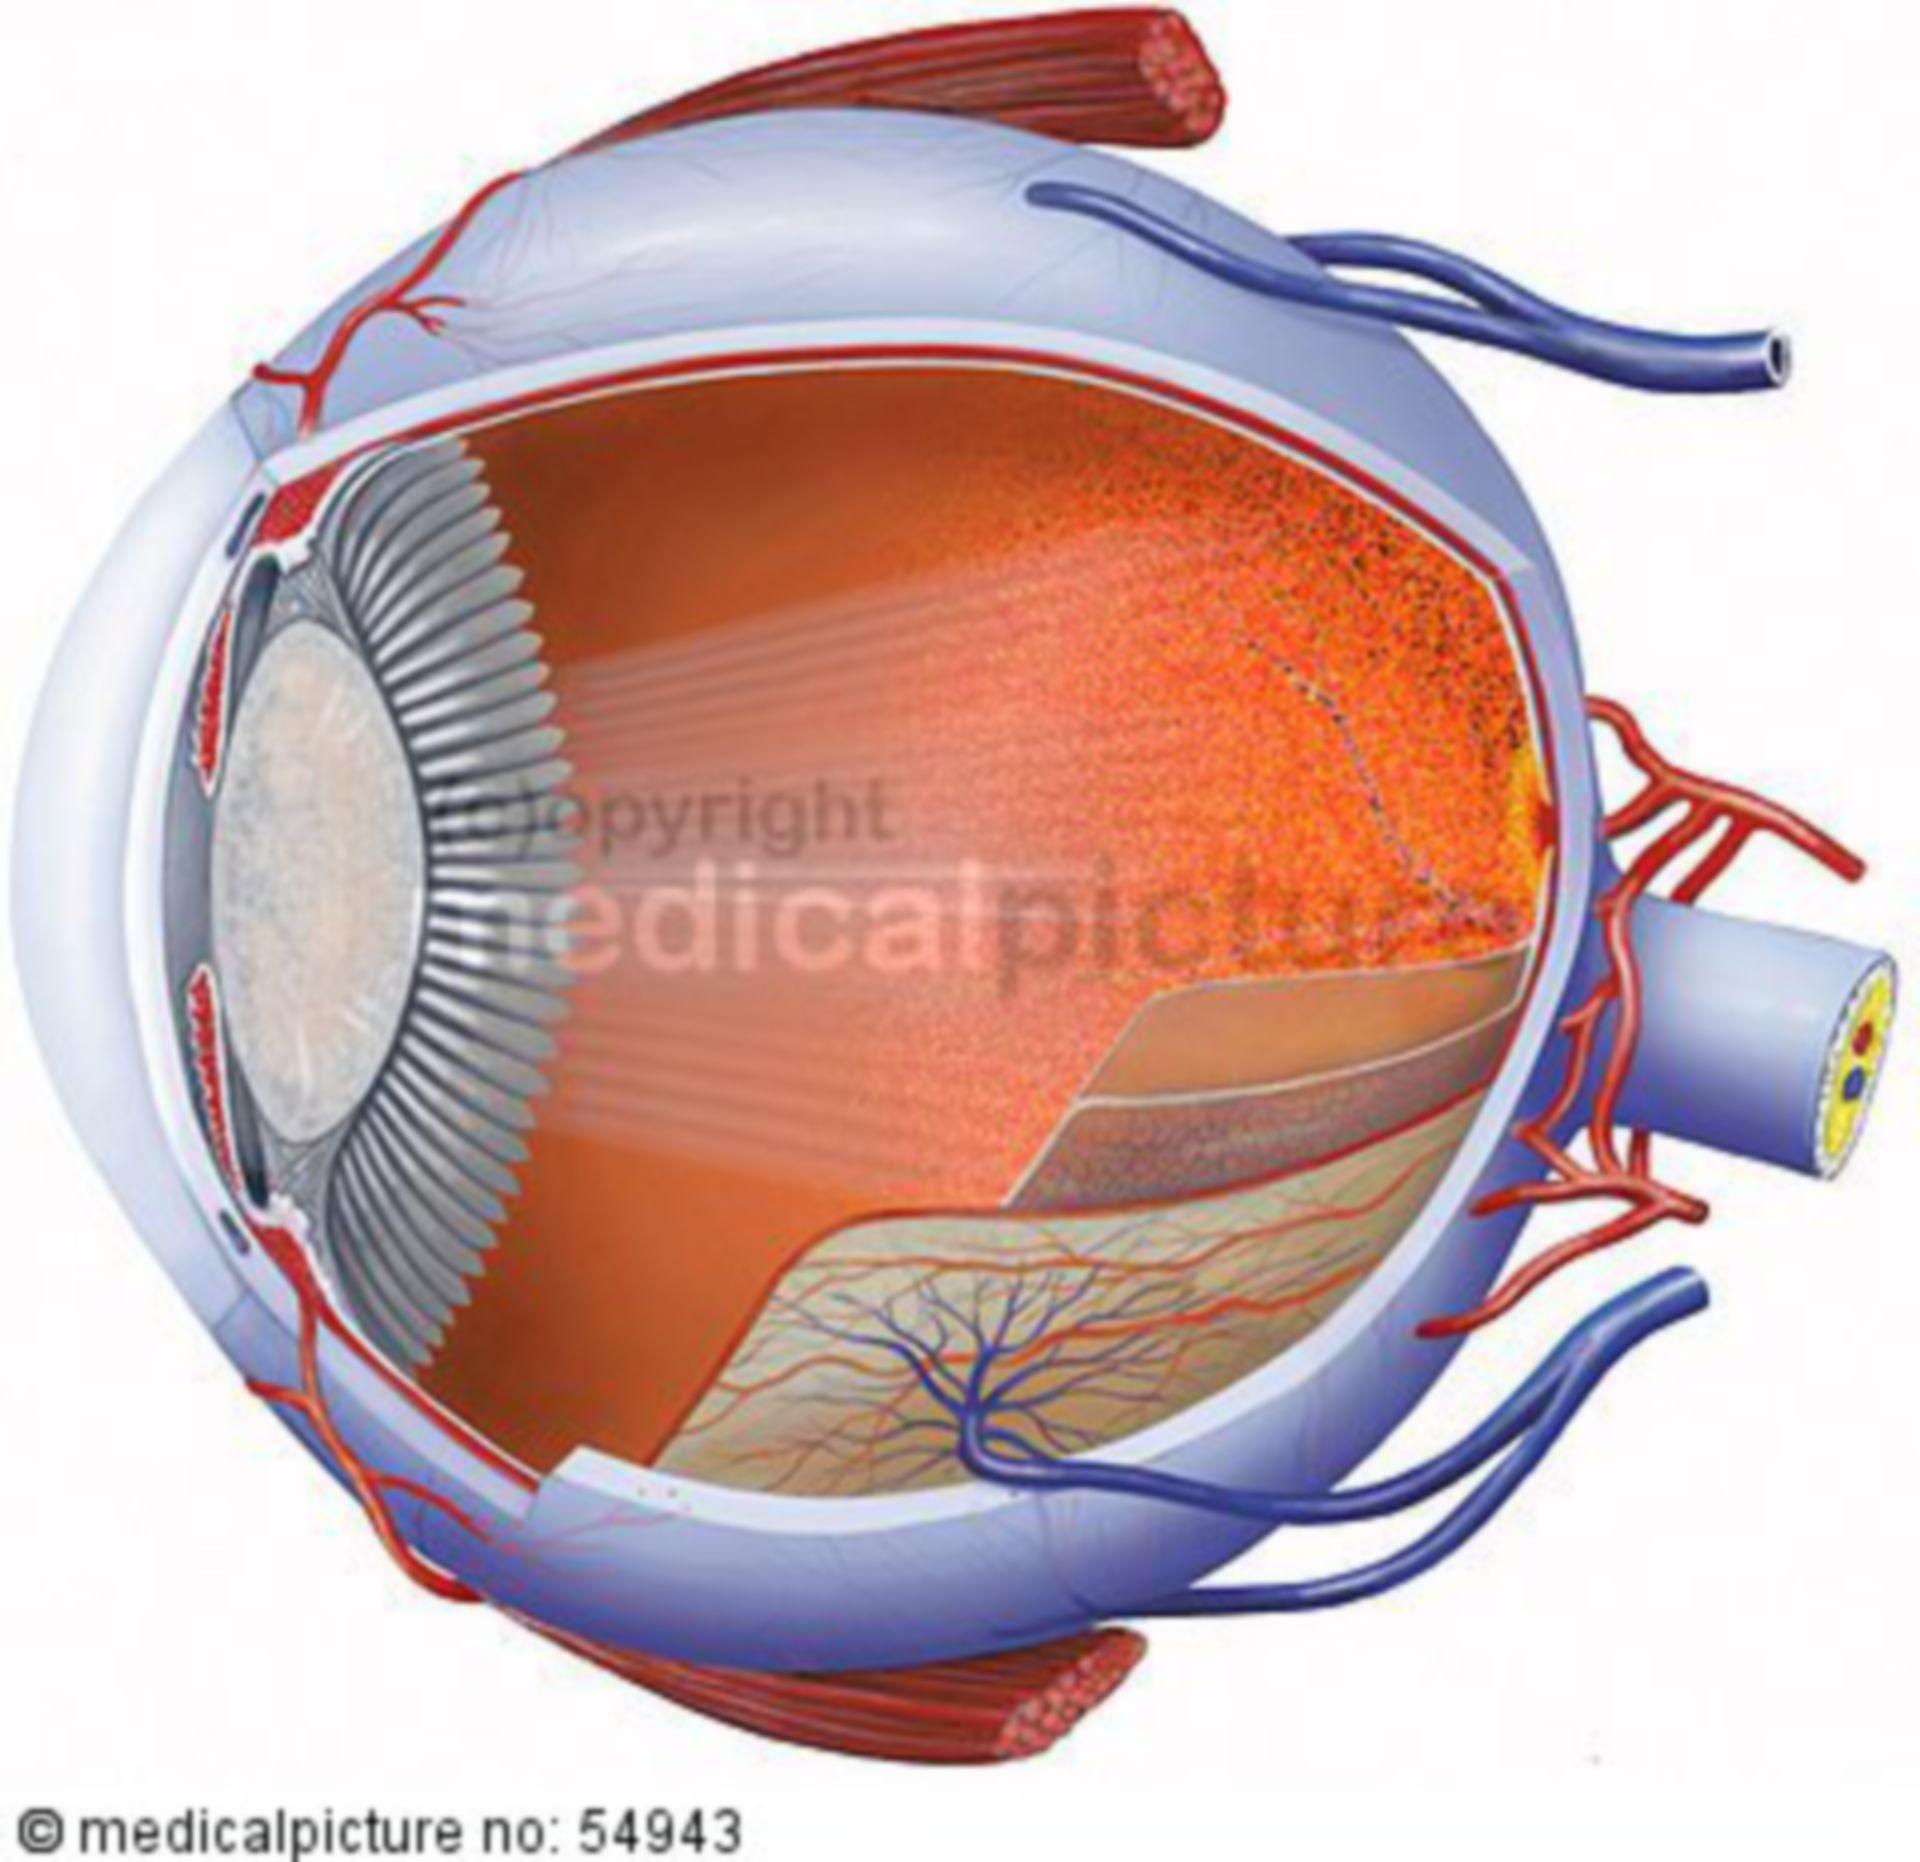 Light impacting a cataract